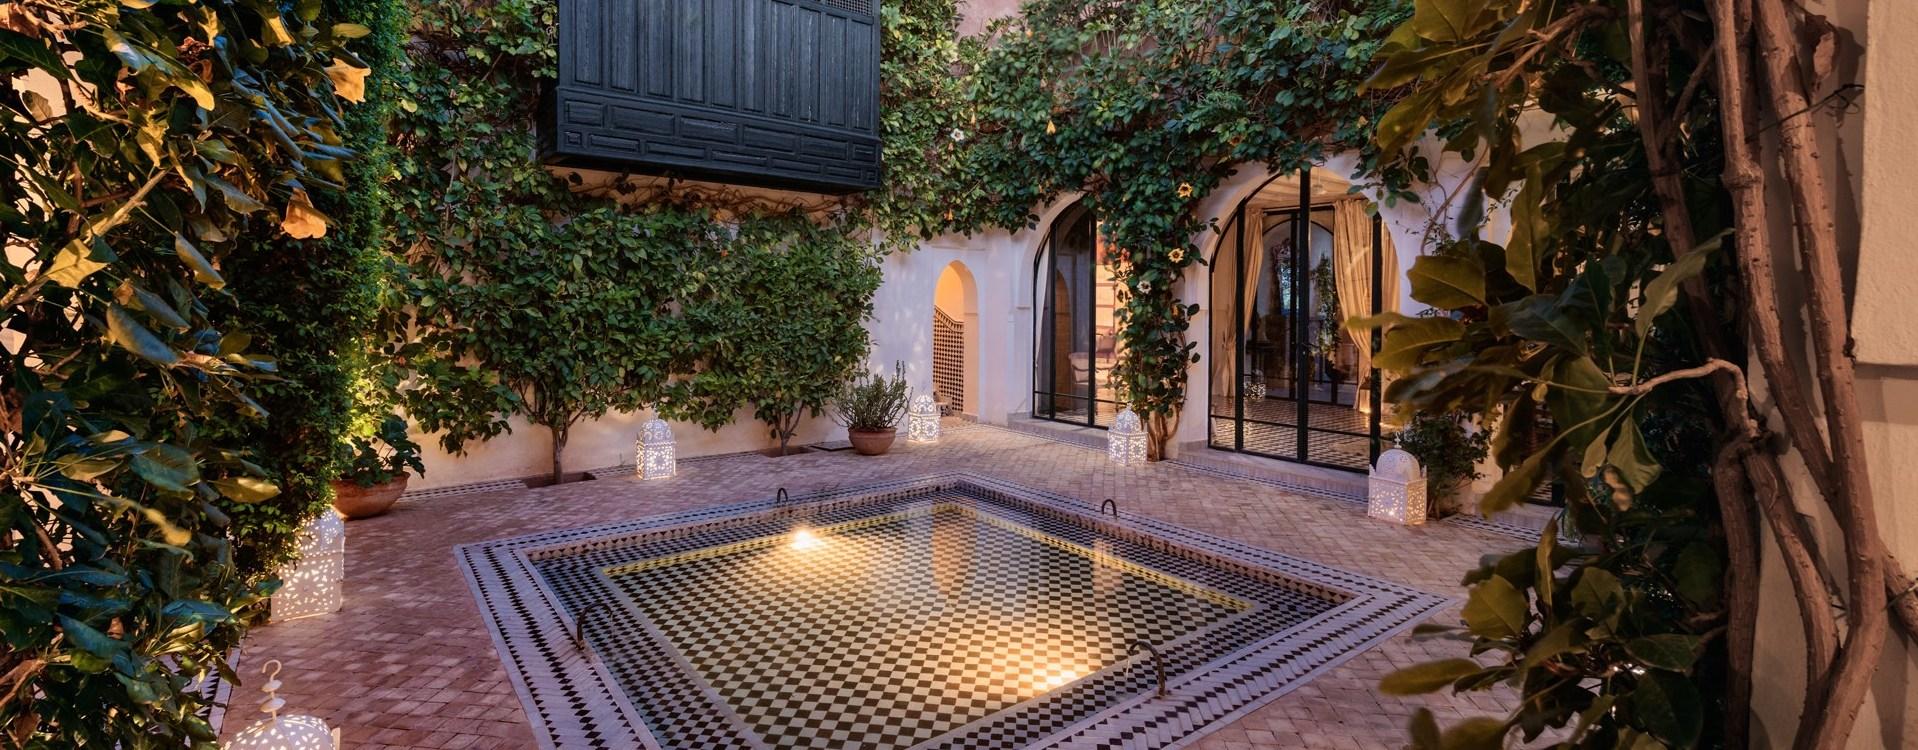 luxury-10-bedroom-villa-marrakech